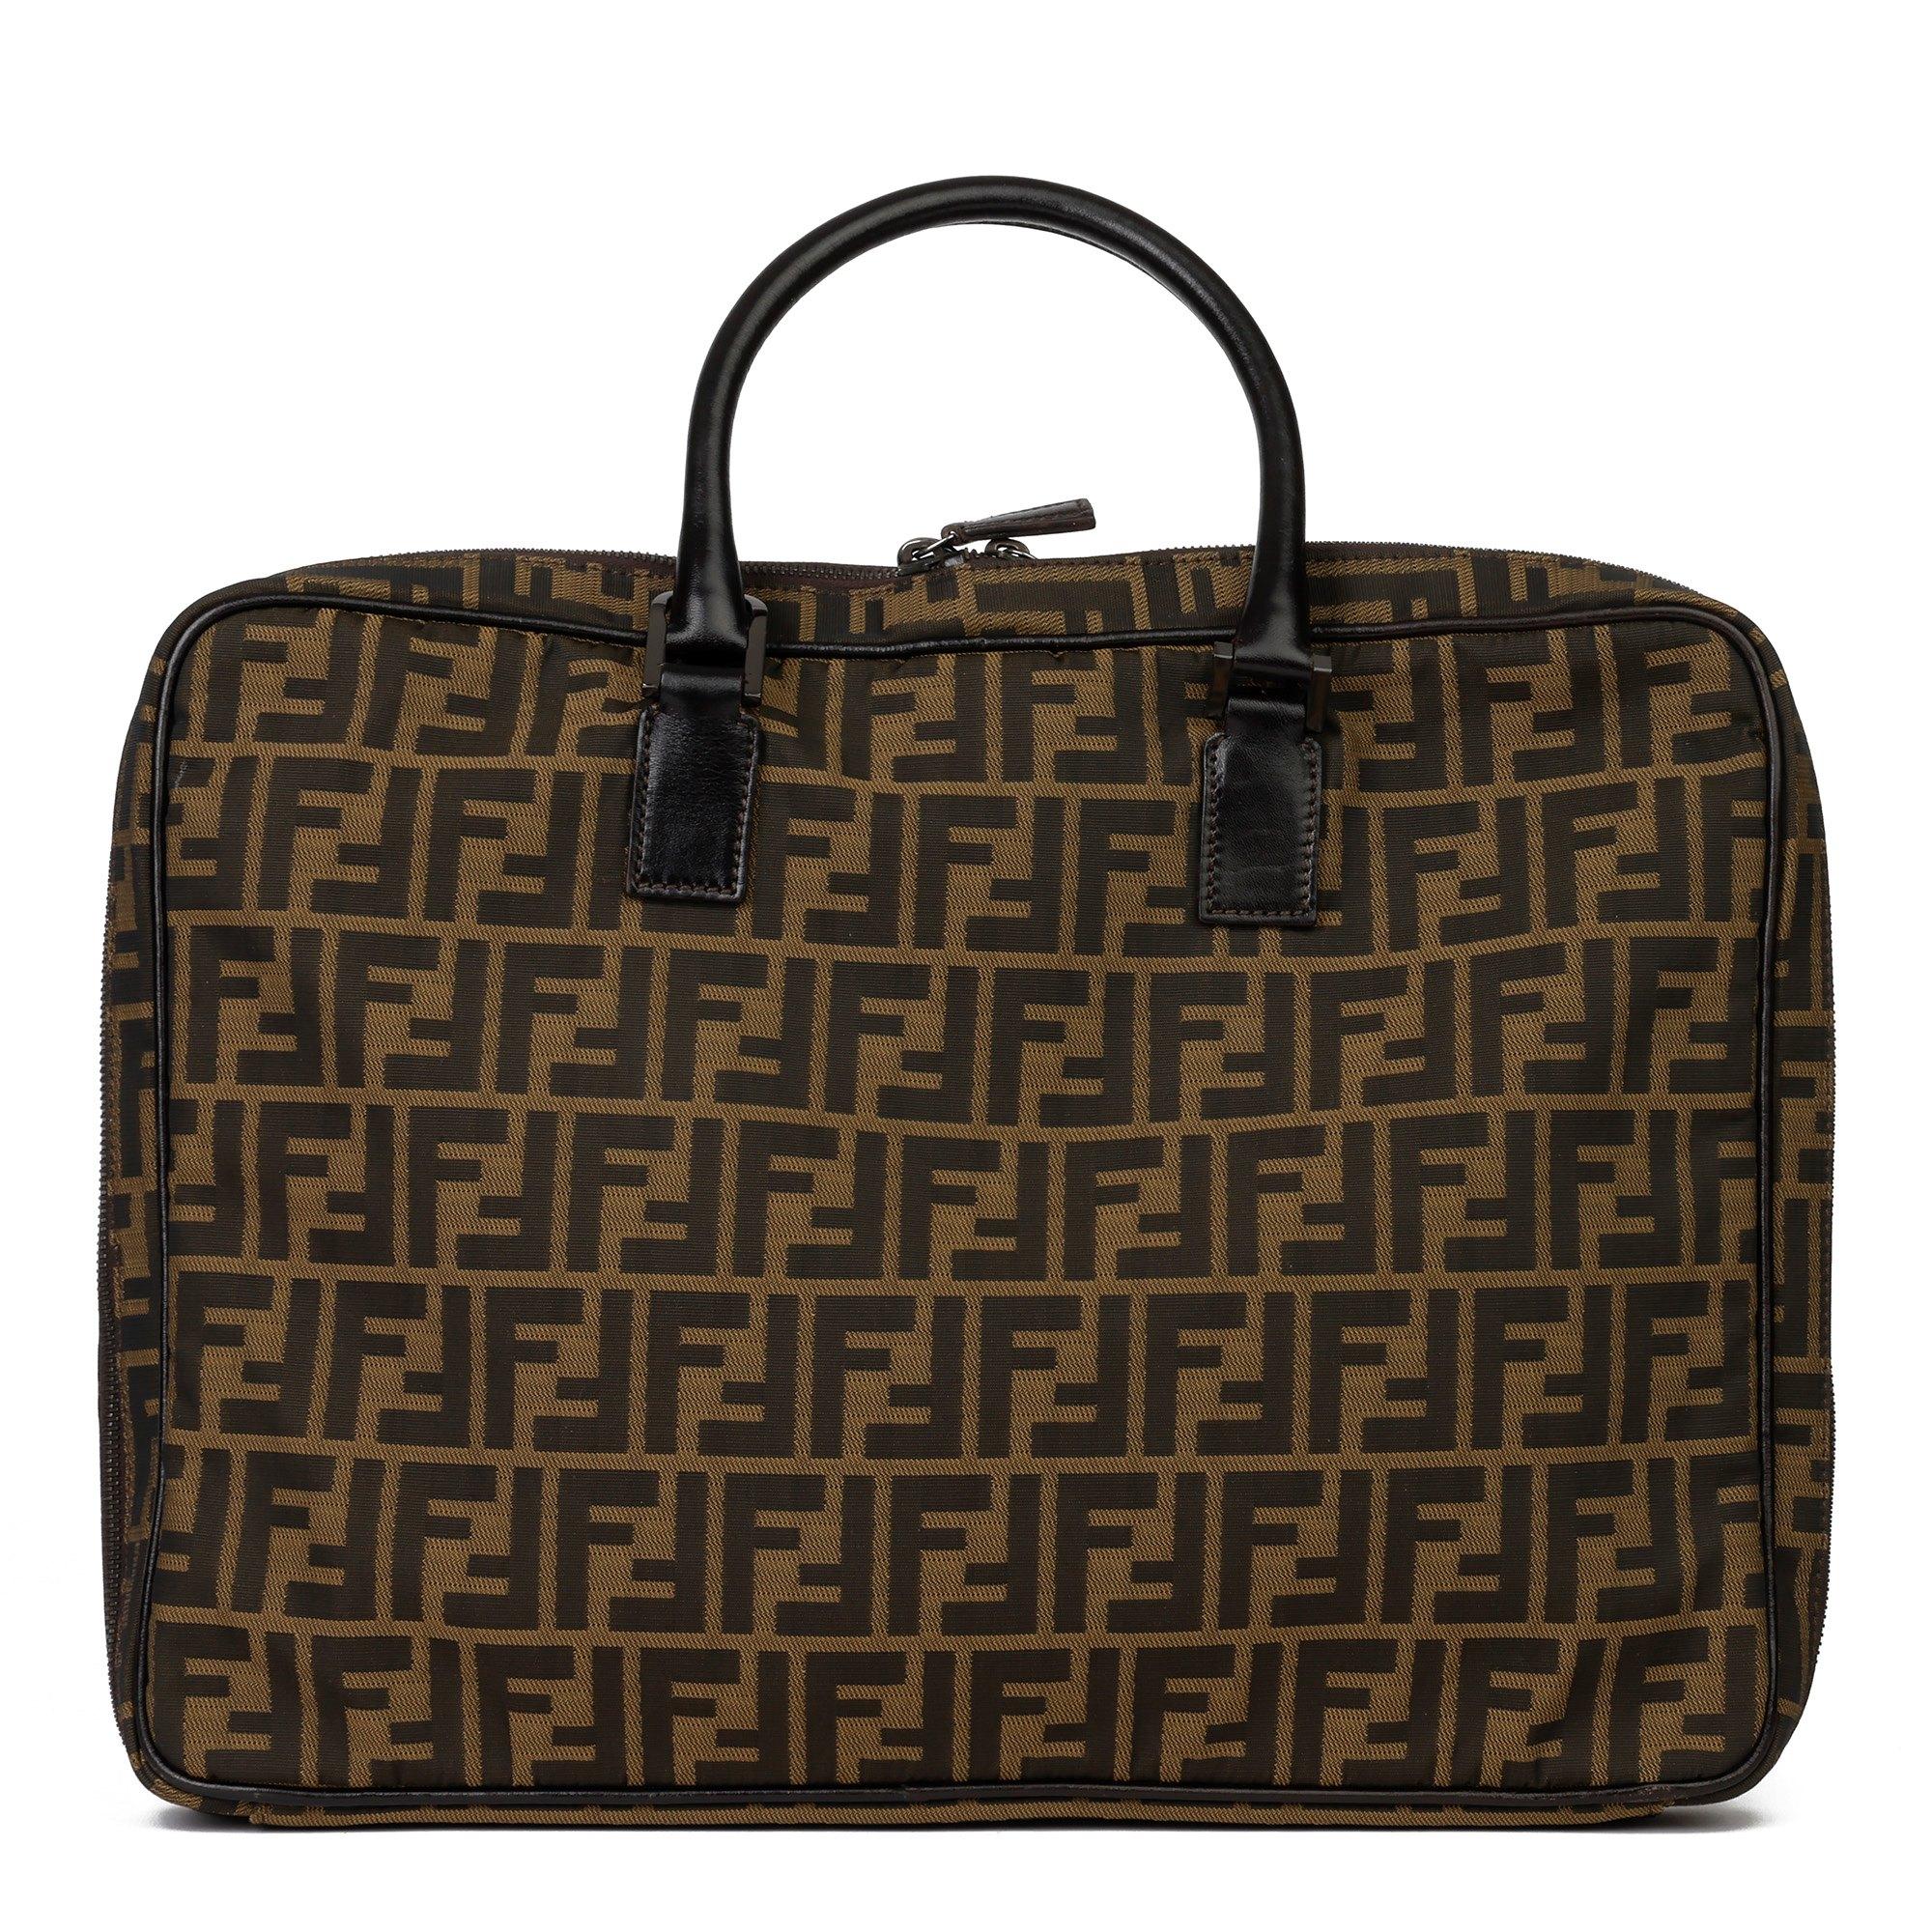 Fendi Brown Zucca Canvas and Calfskin Leather Briefcase